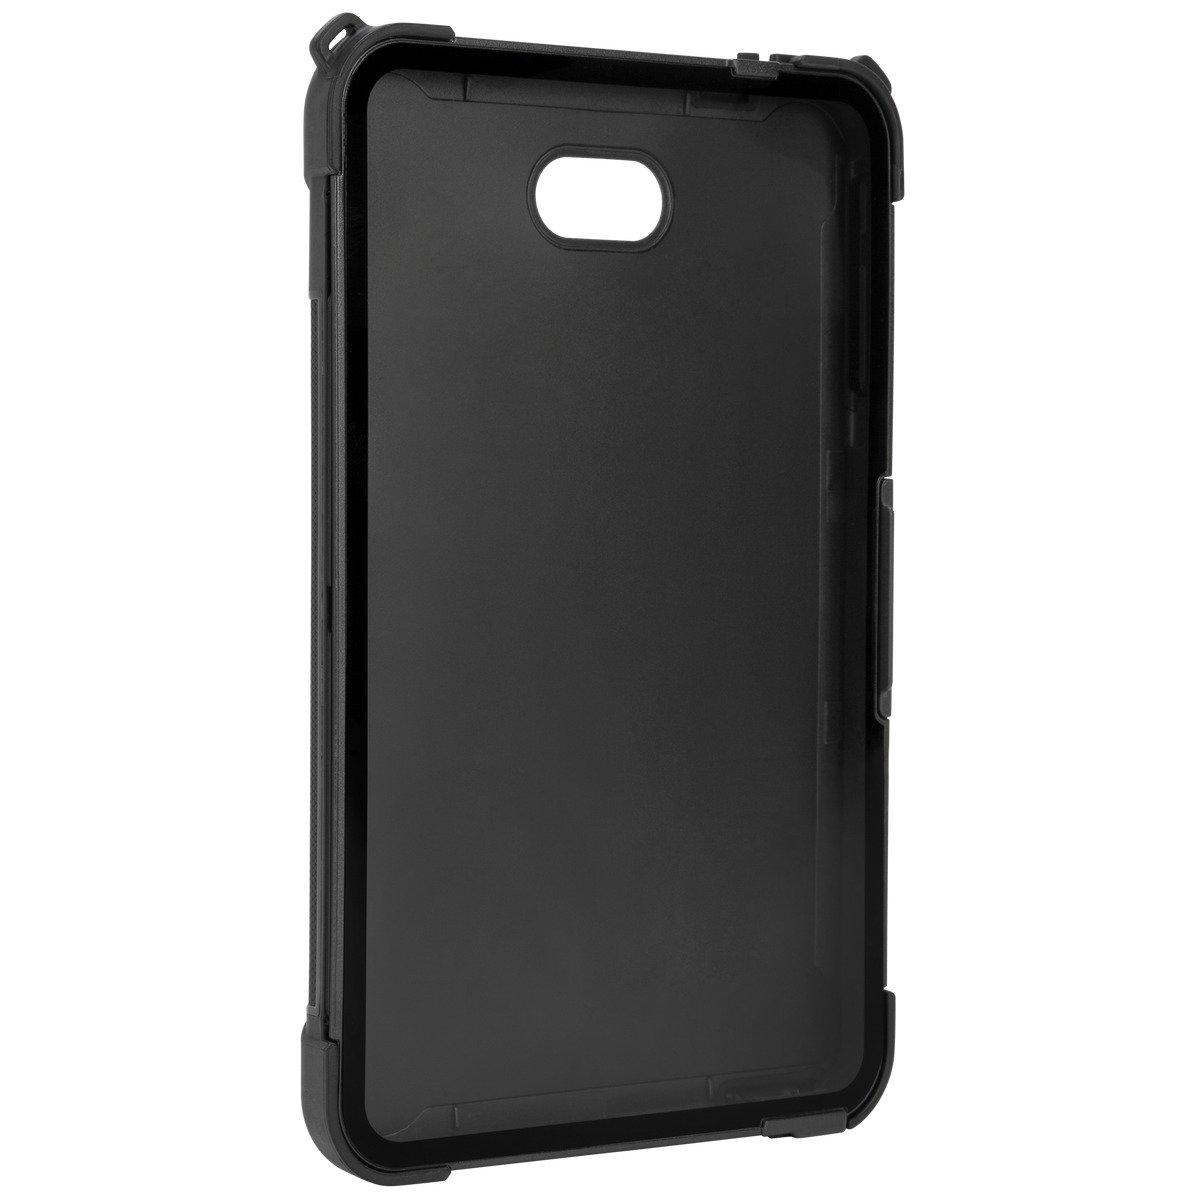 Targus SafePort Rugged Max Pro Tablet Case for Dell Venue 8 Pro 5855, Black  (THD461USZ)